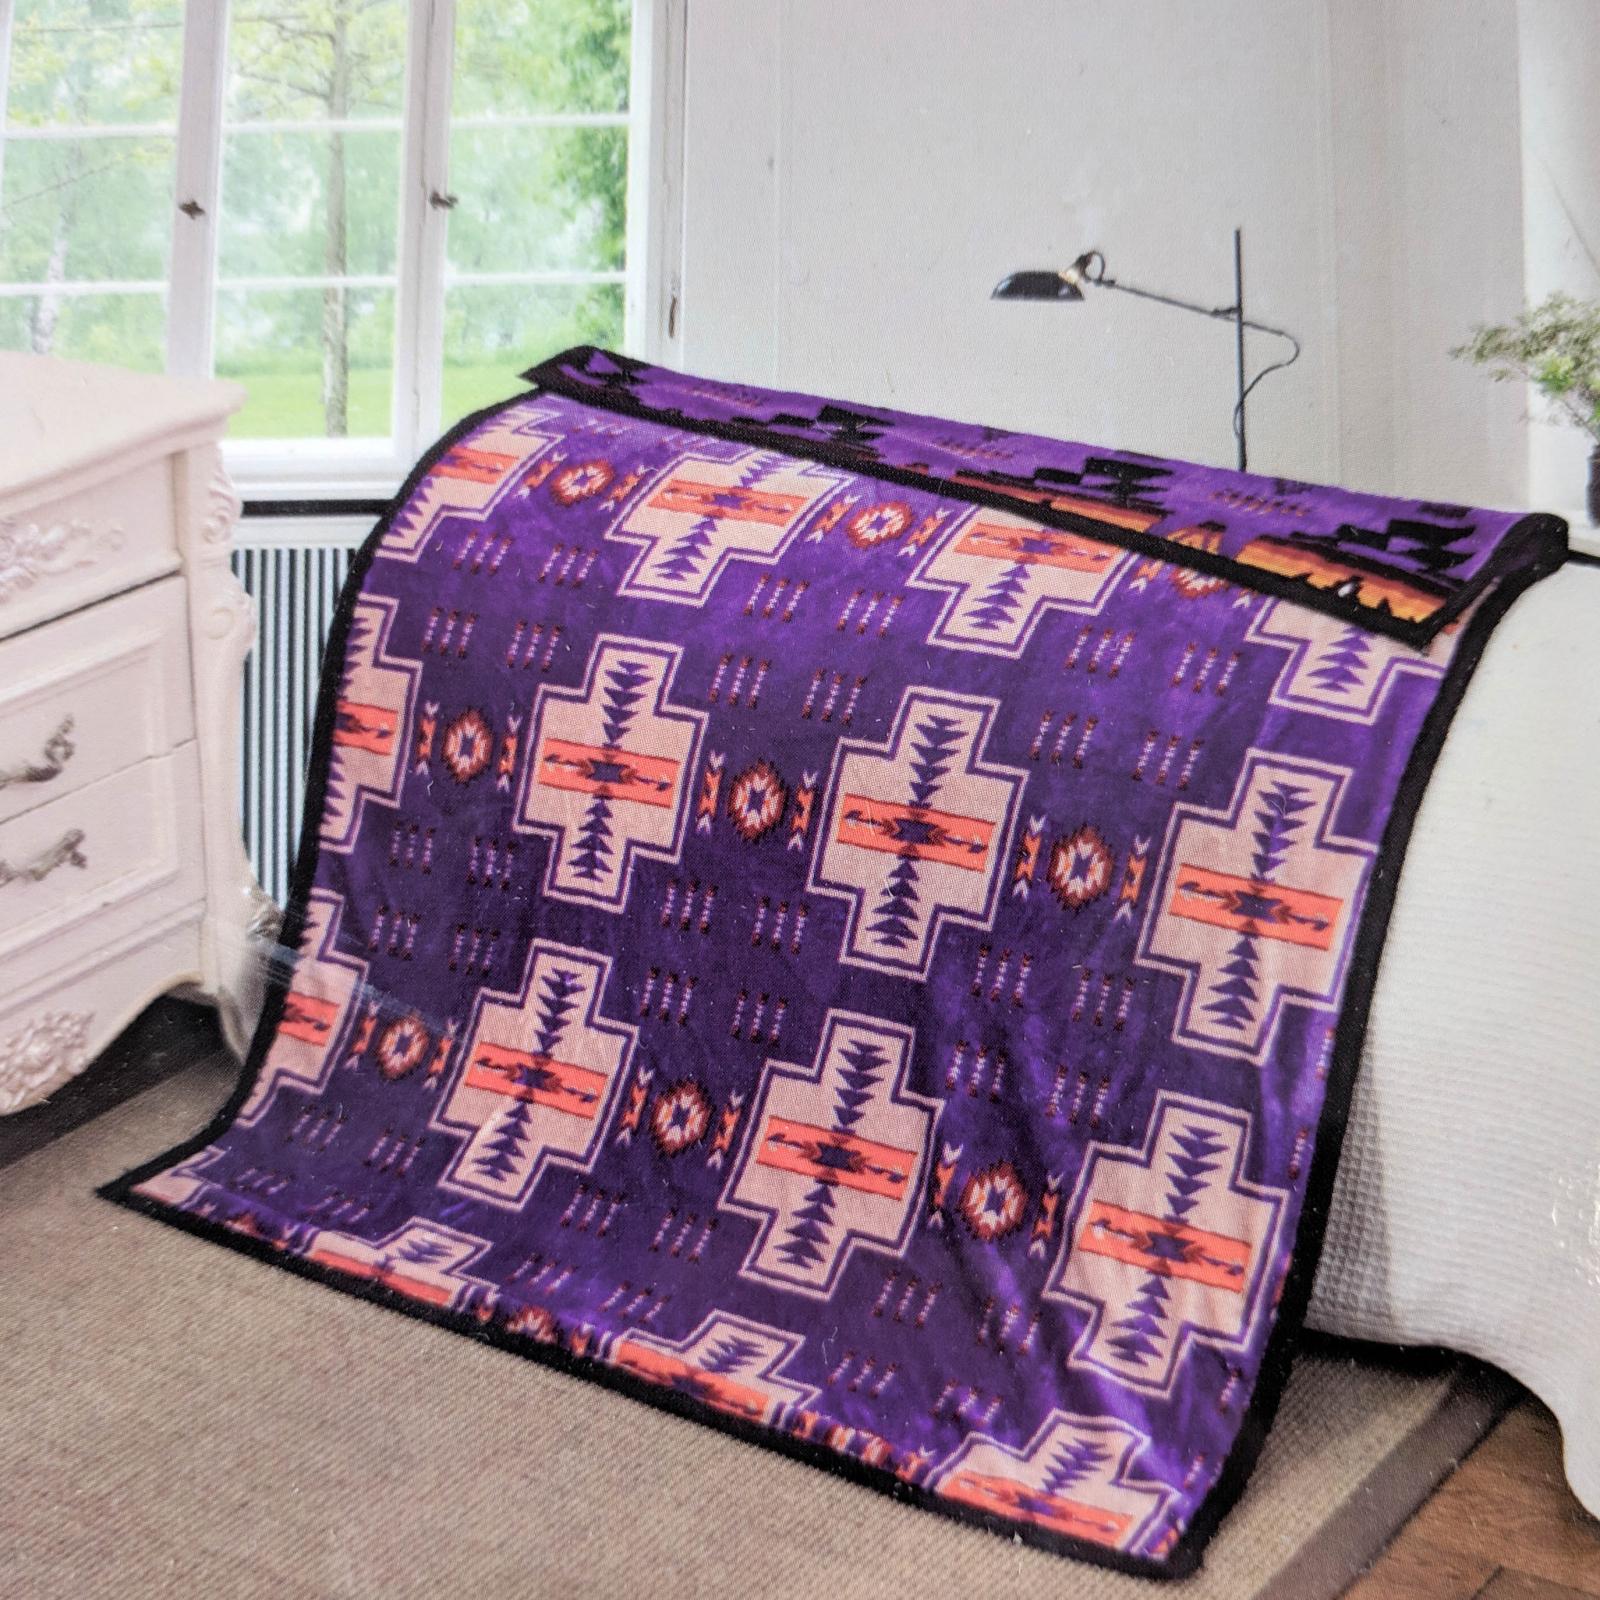 ASR Outdoor Adventure Wilderness Reversible Blanket Southwest Design - Purple